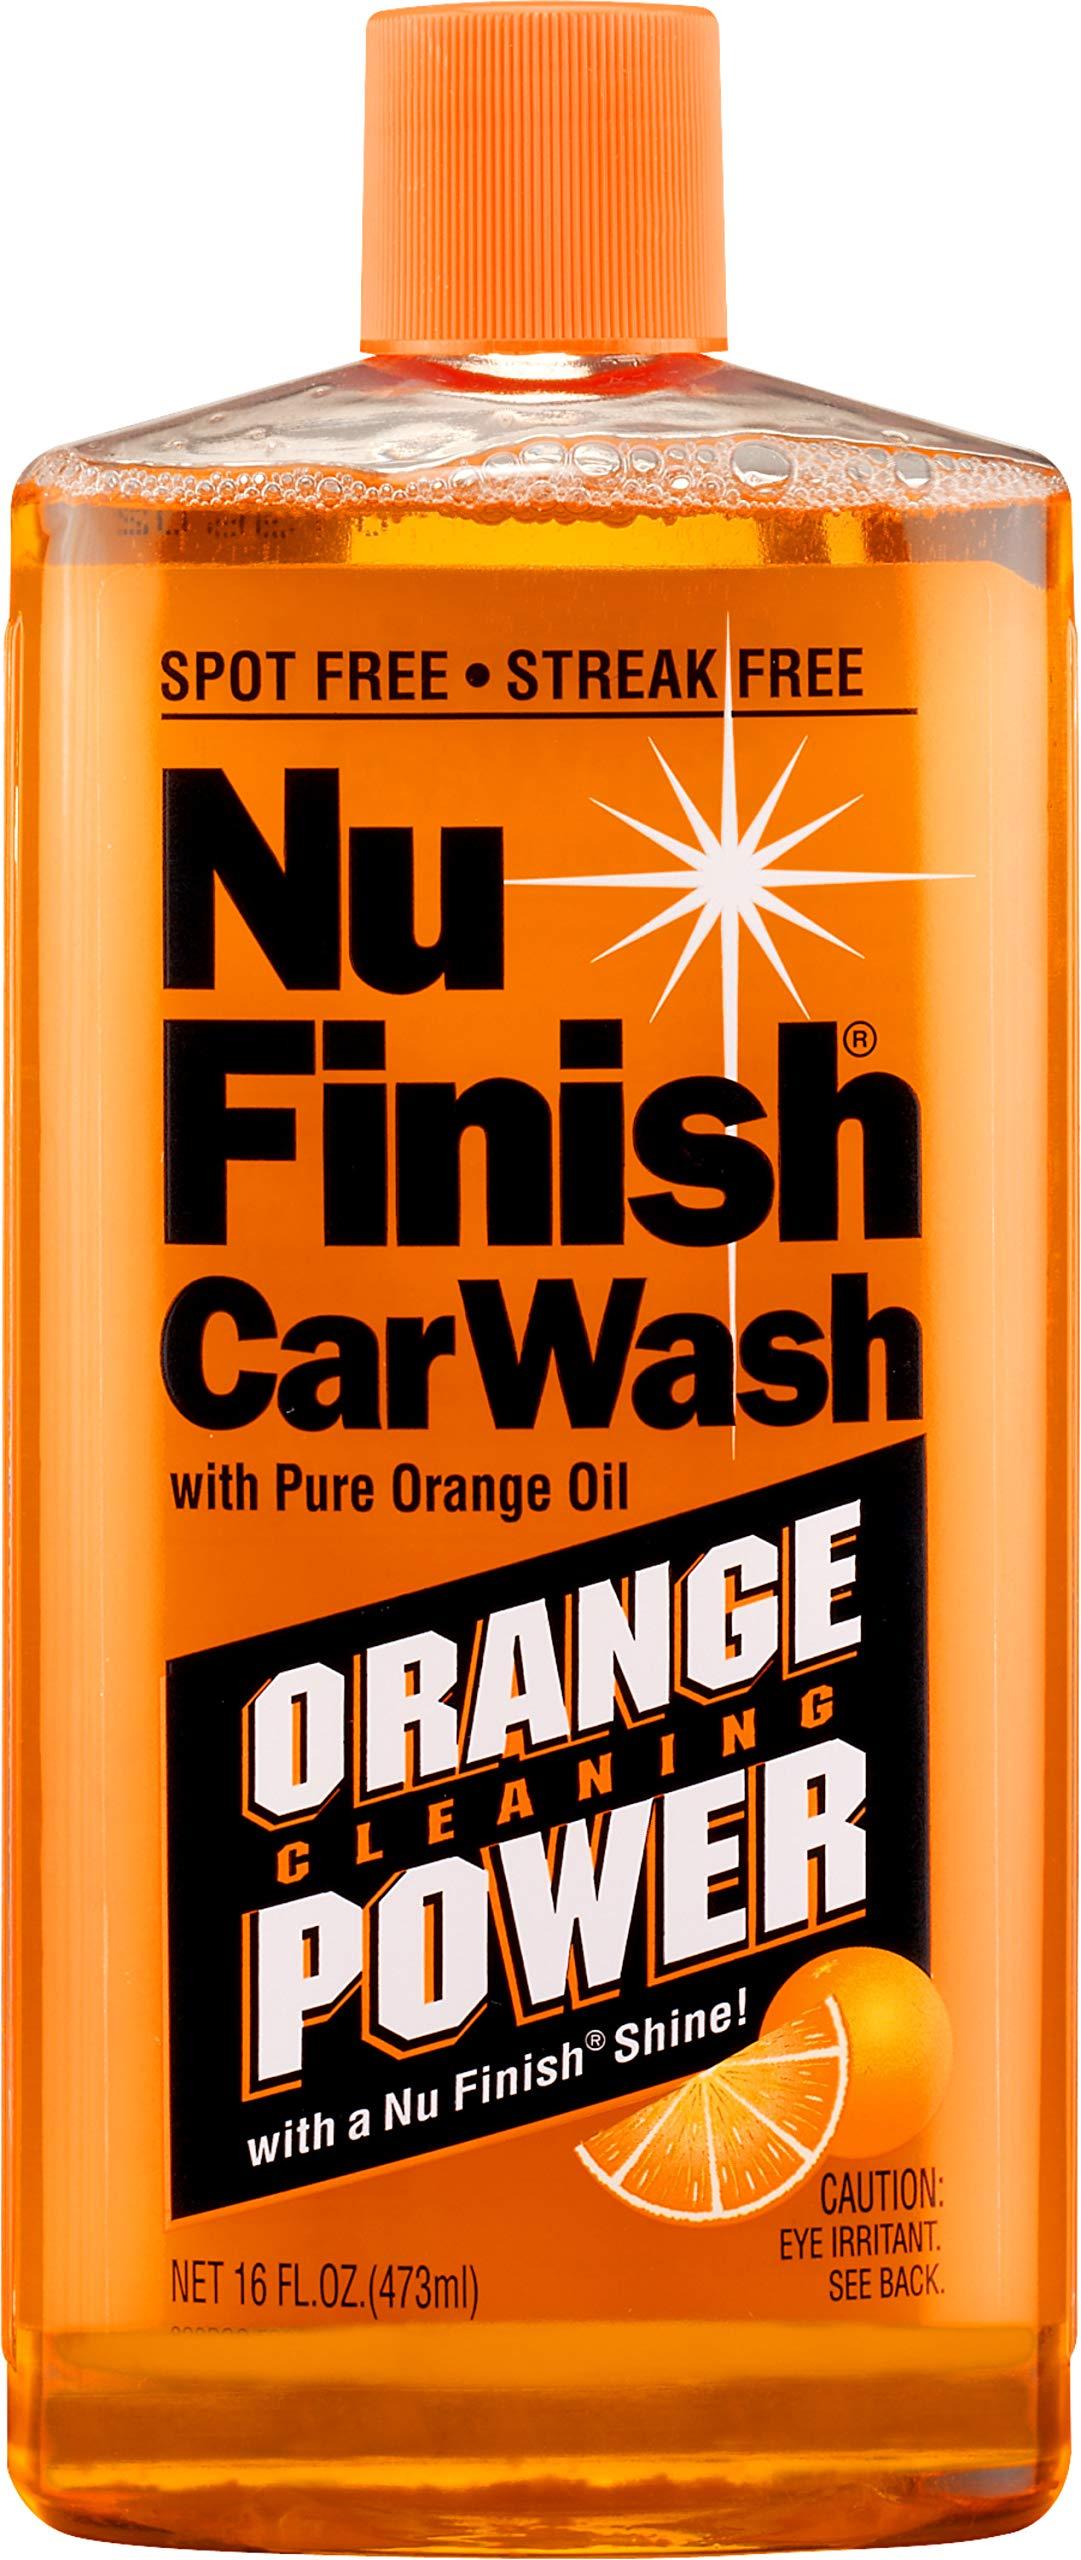 Nu Finish Car Wash Soap, No Spots Or Streaks, Pure Orange Oil Formula, Removes Tar, Tree Sap, Bugs, Bird Droppings, 16 oz.